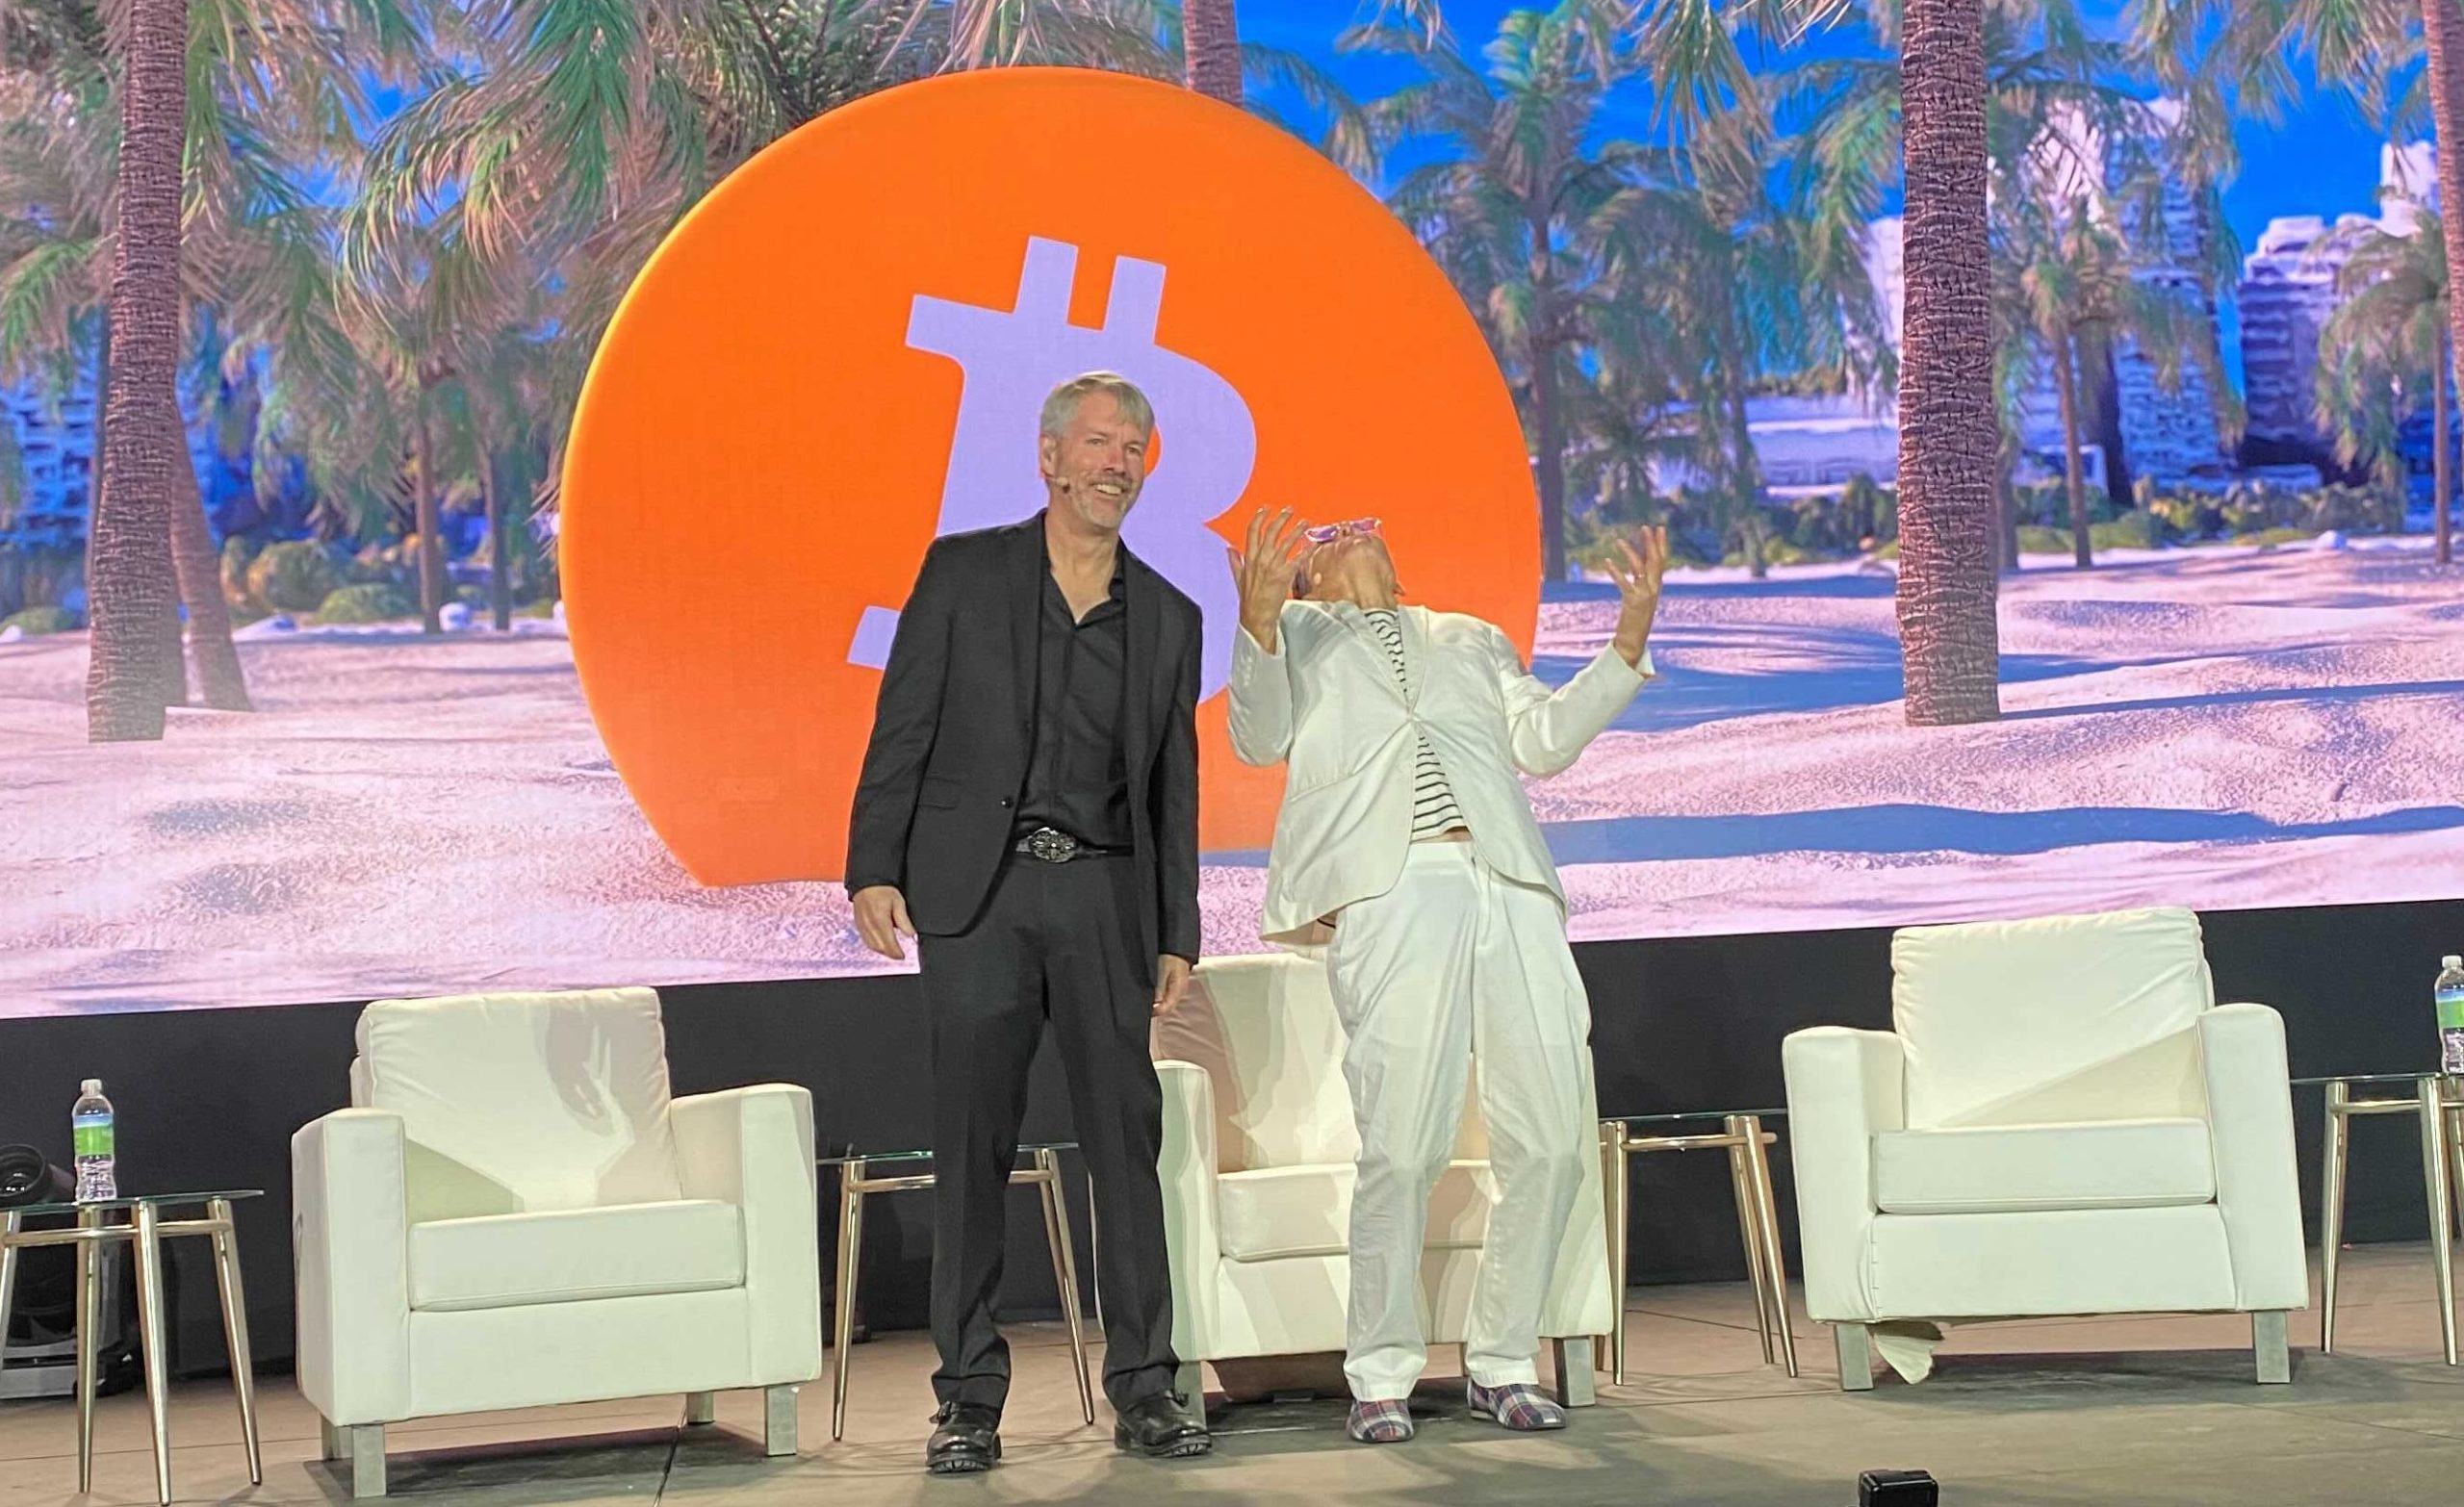 bitcoin 2021 konferansi nasil gecti iste tum detaylar dikkat ceken alintilar 2